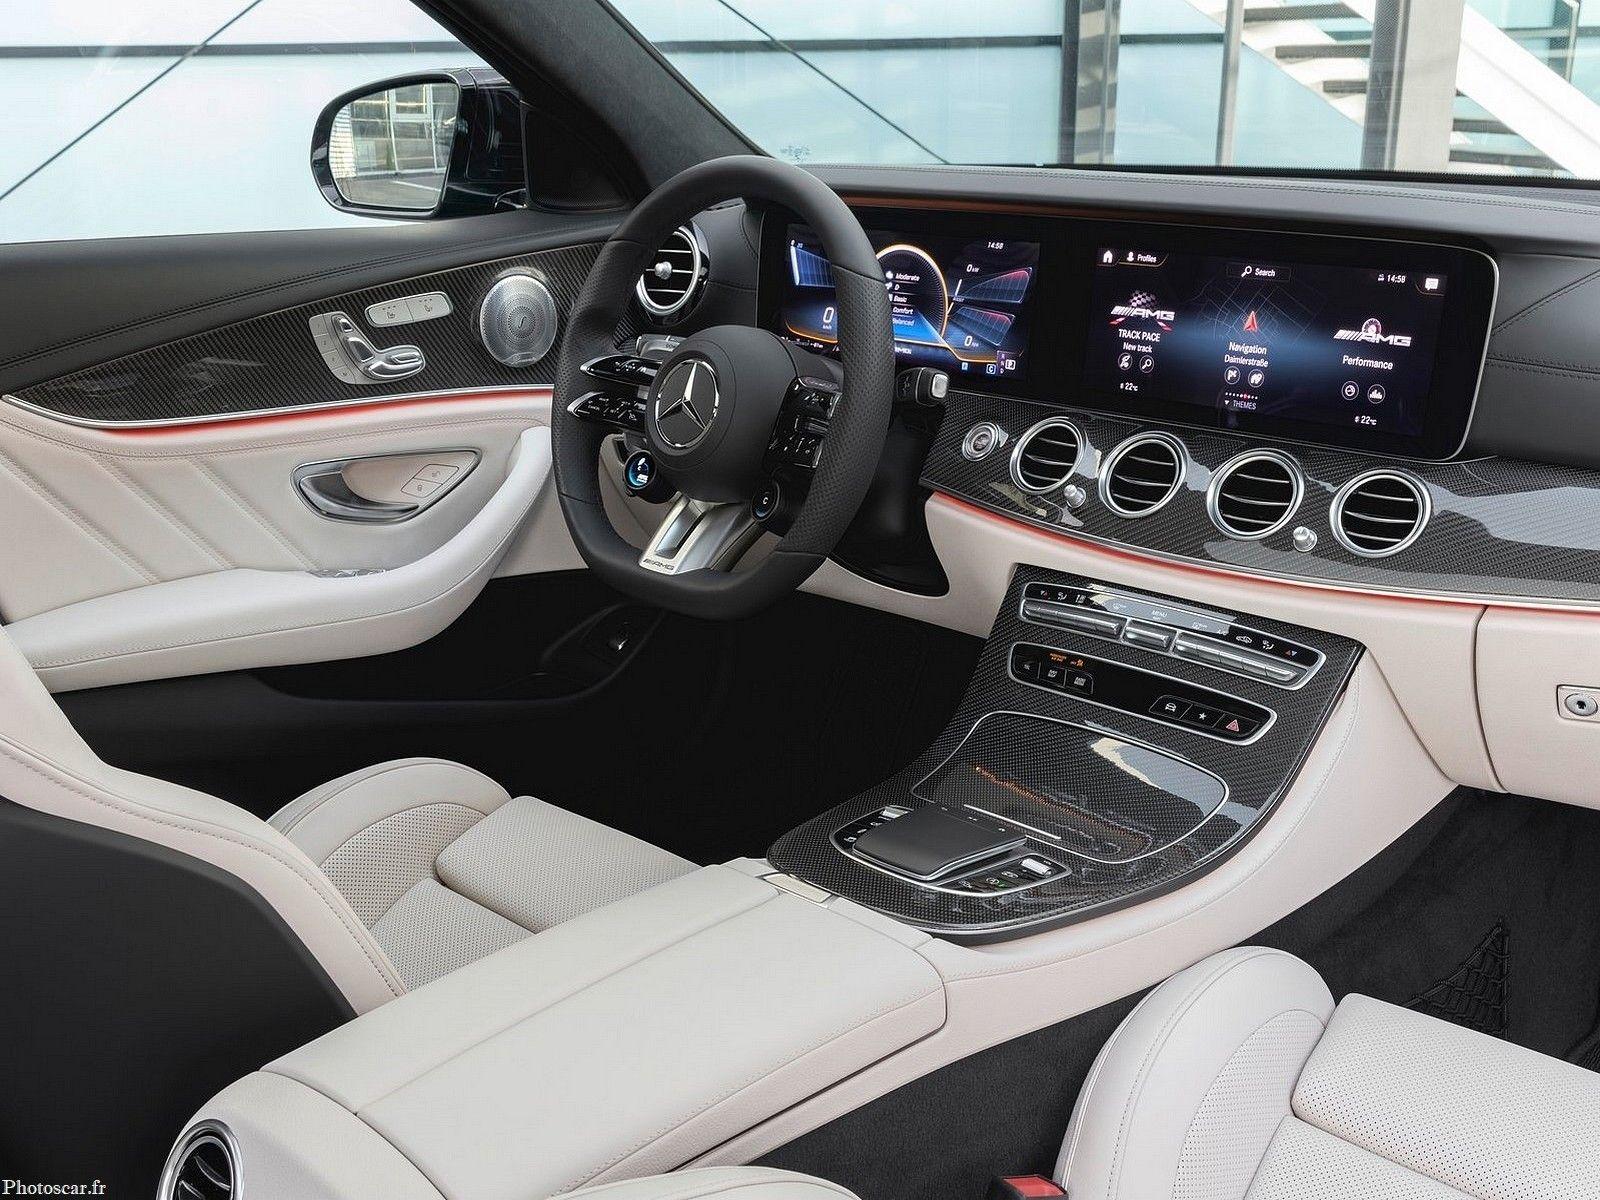 Mercedes Amg E53 Estate 2021 Des Performances Impressionnantes En 2020 Mercedes Classe E Mercedes Benz Mercedes